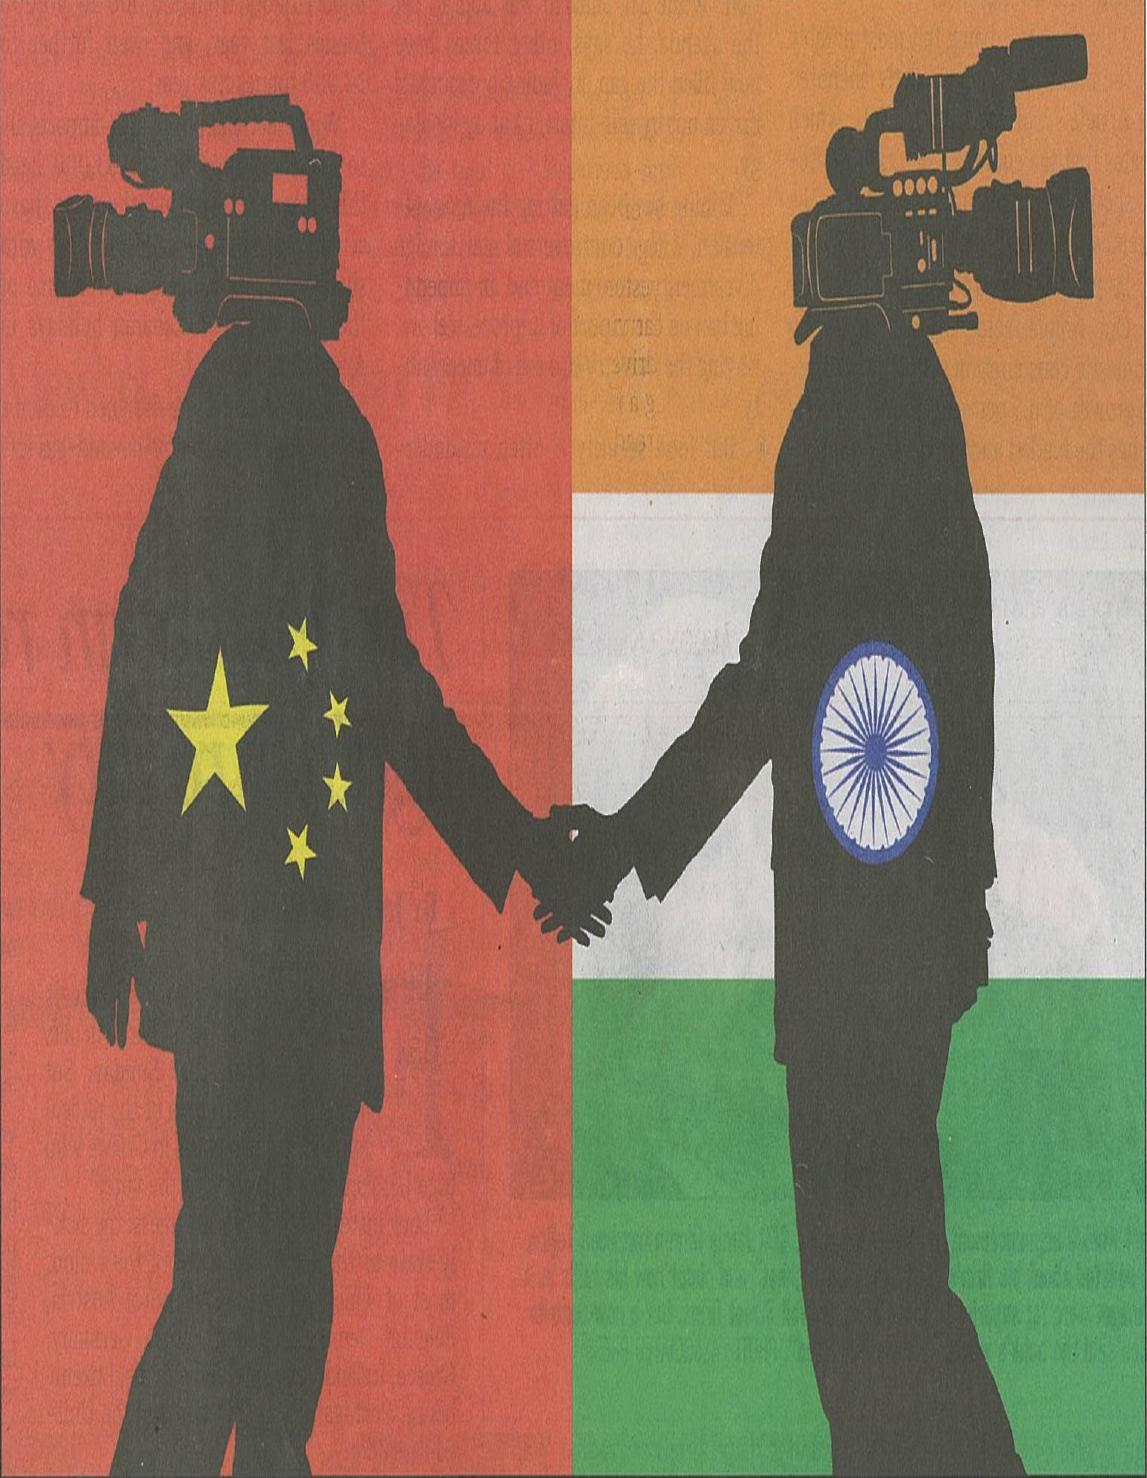 India-China Media Relations: Panda and Elephant at Cross-purposes